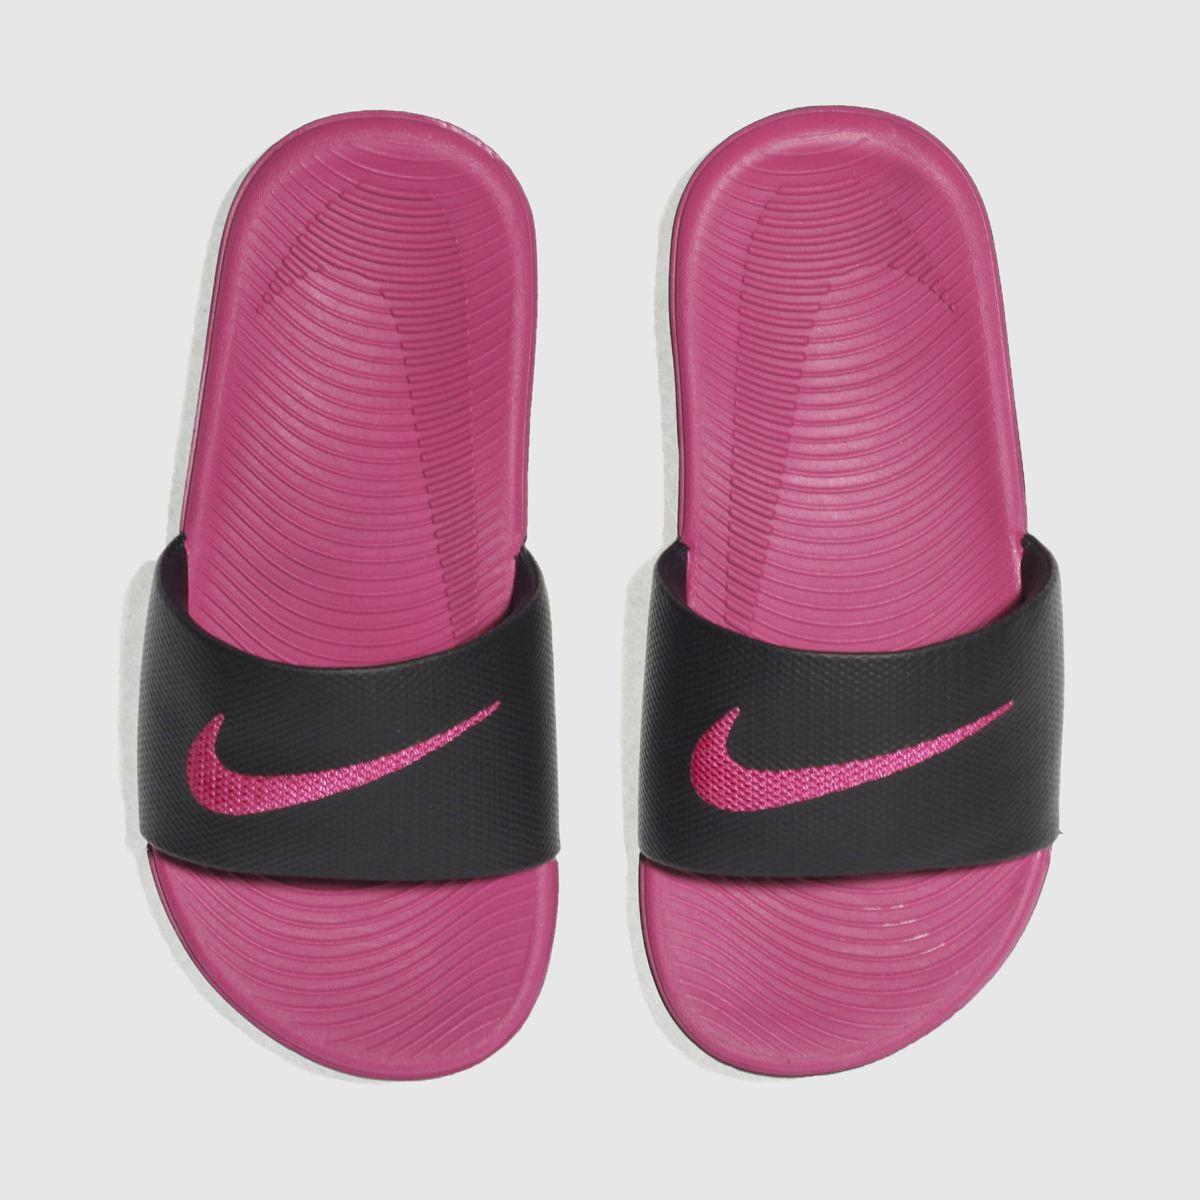 Nike Black & Pink Kawa Slide Girls Junior Sandals